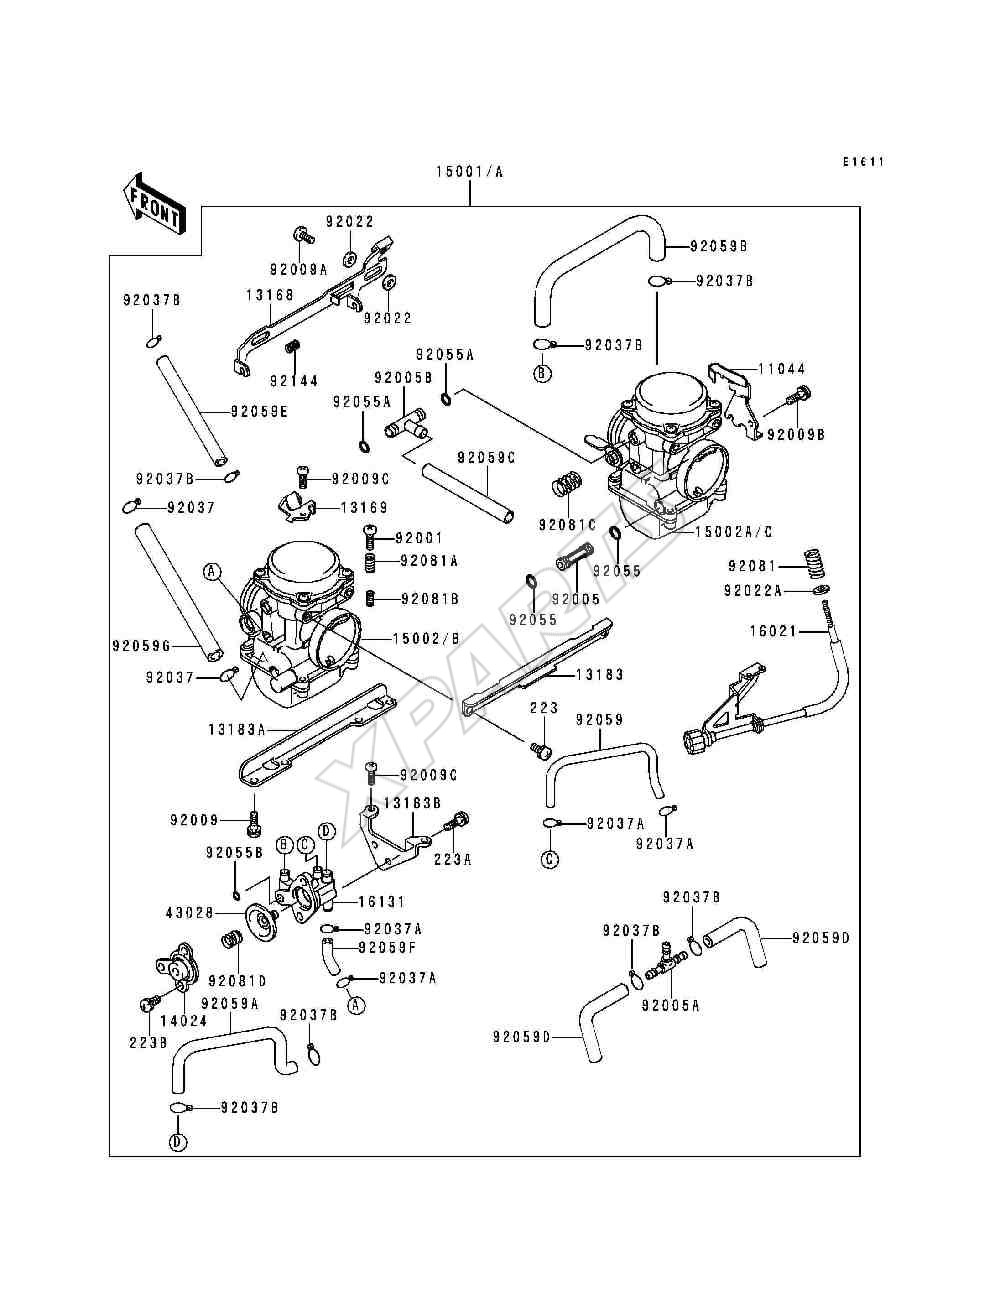 1993 Ninja 250r Ex250 F7 Wiring Diagram Picture For Category Carburetor